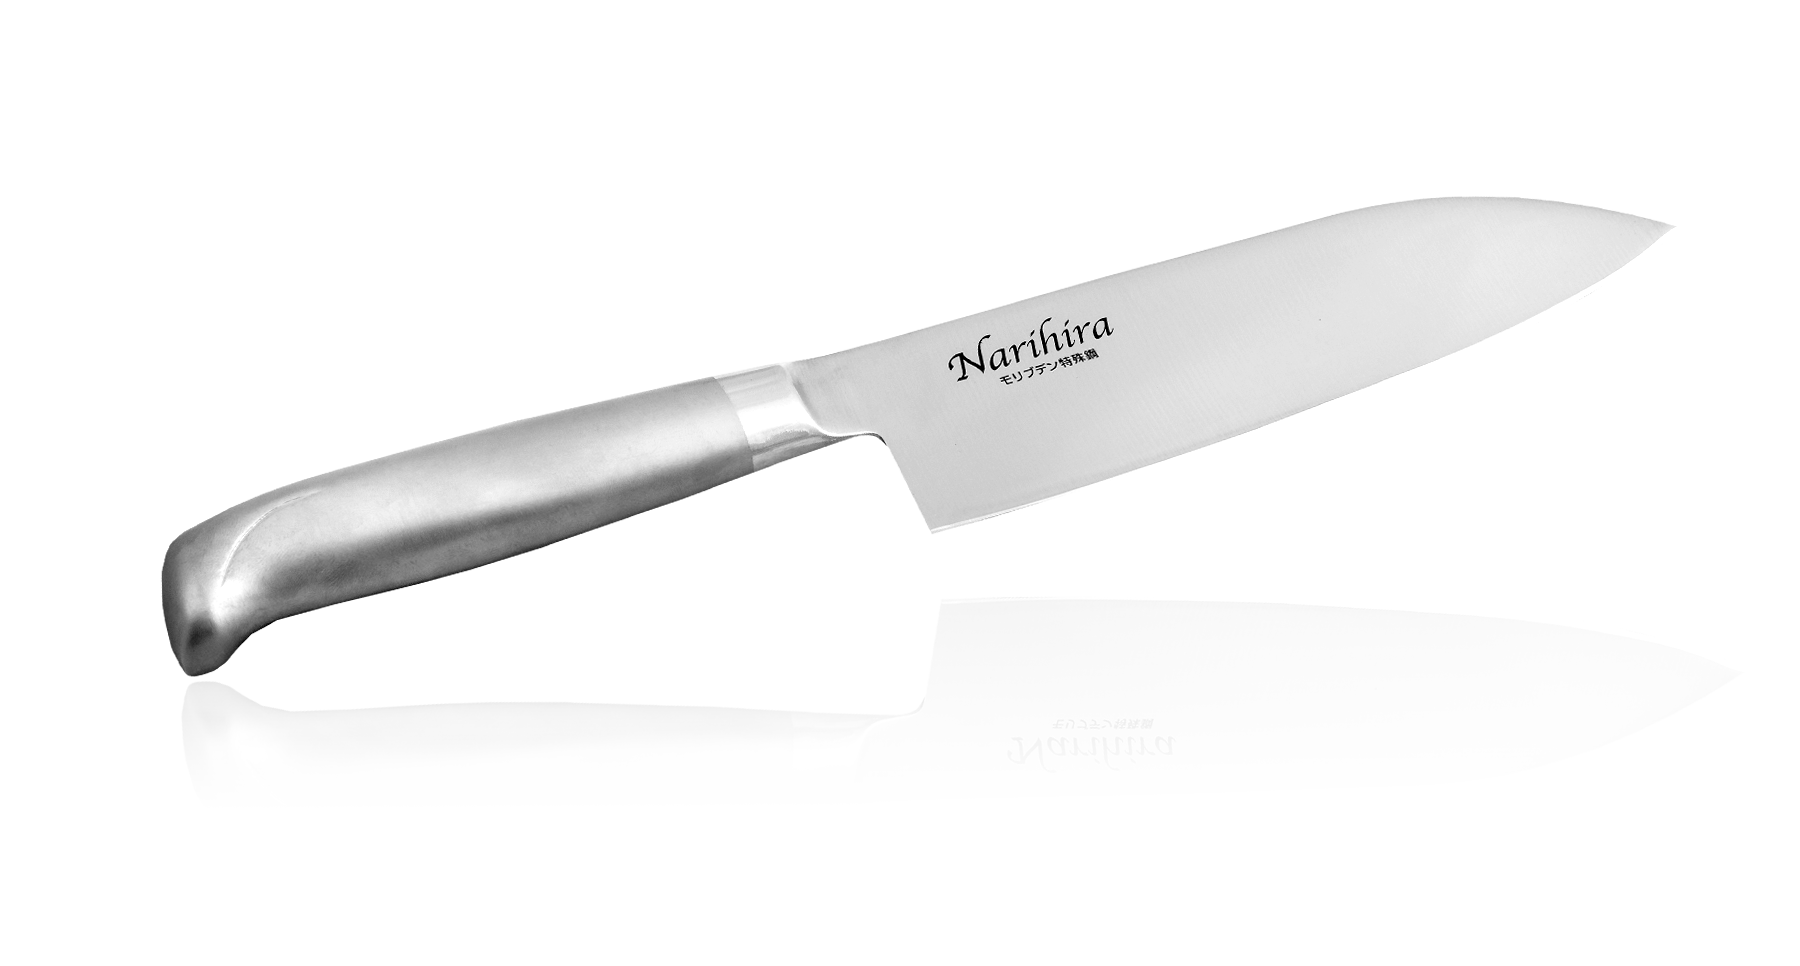 Нож Сантоку Narihira 170 мм, сталь AUS-8, стальная рукоять